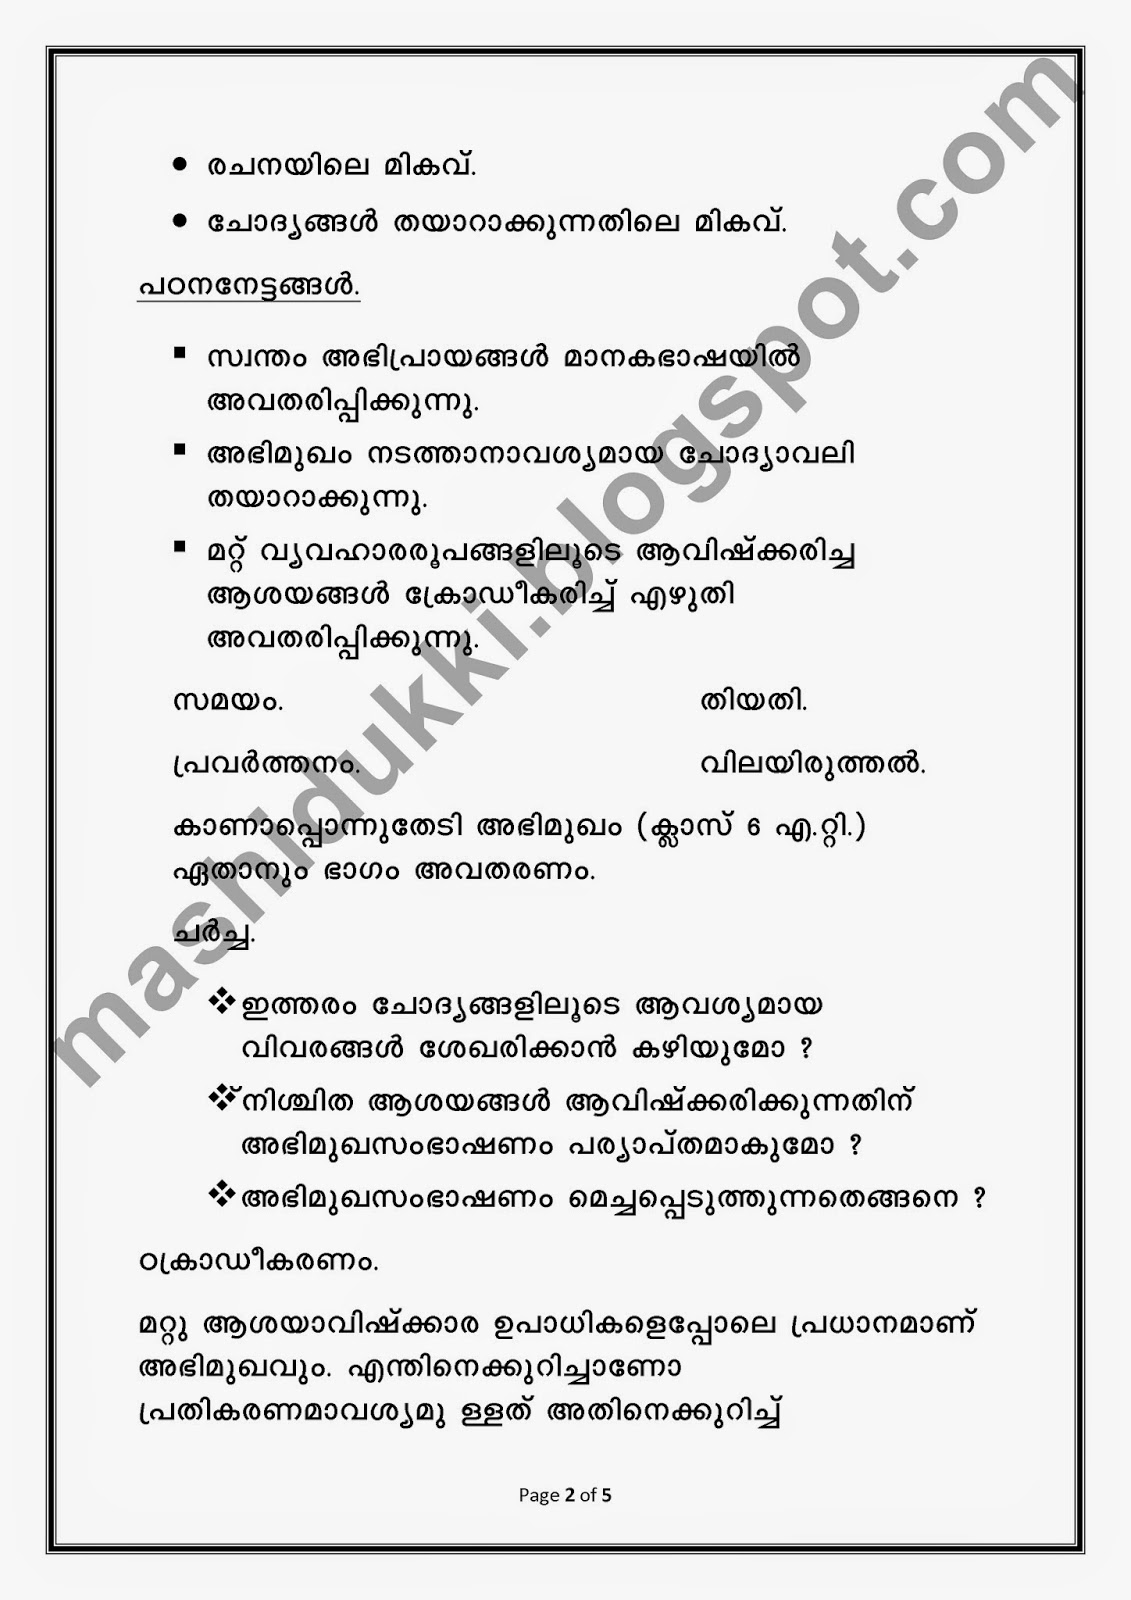 malayalam mash teaching manual std 7 module 3 rh mashidukki blogspot com